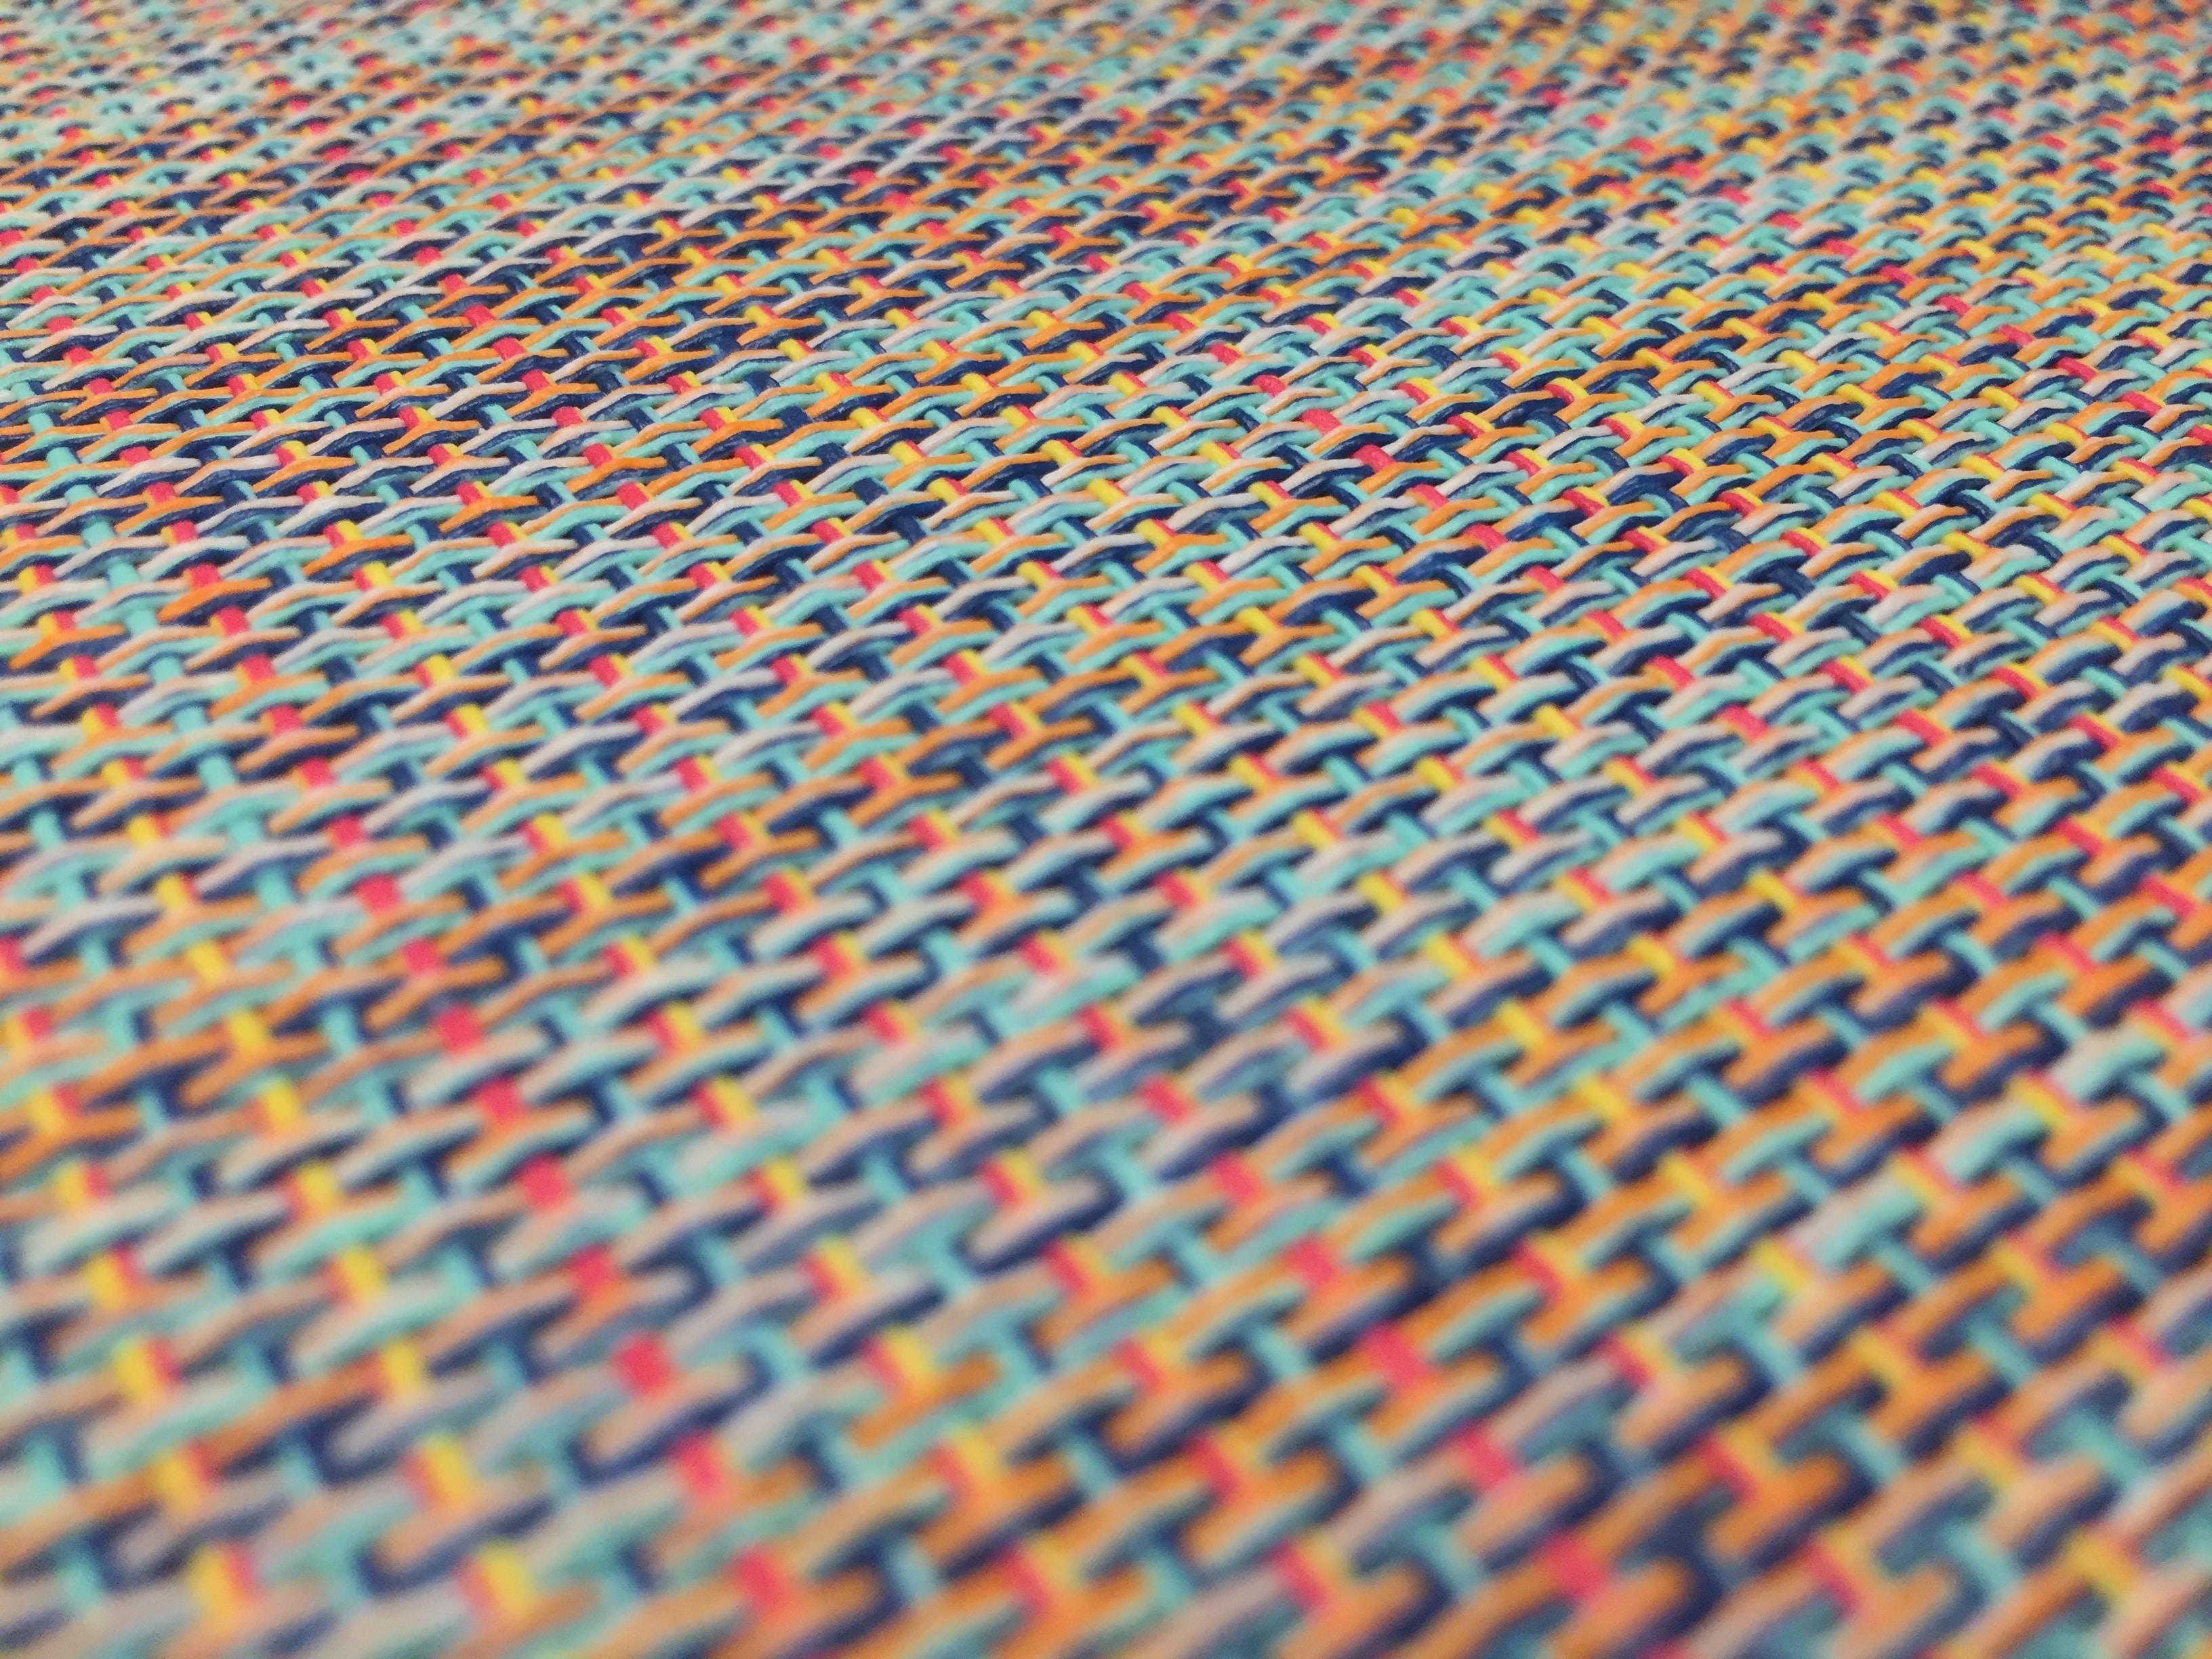 close-up photo of multicolored textile